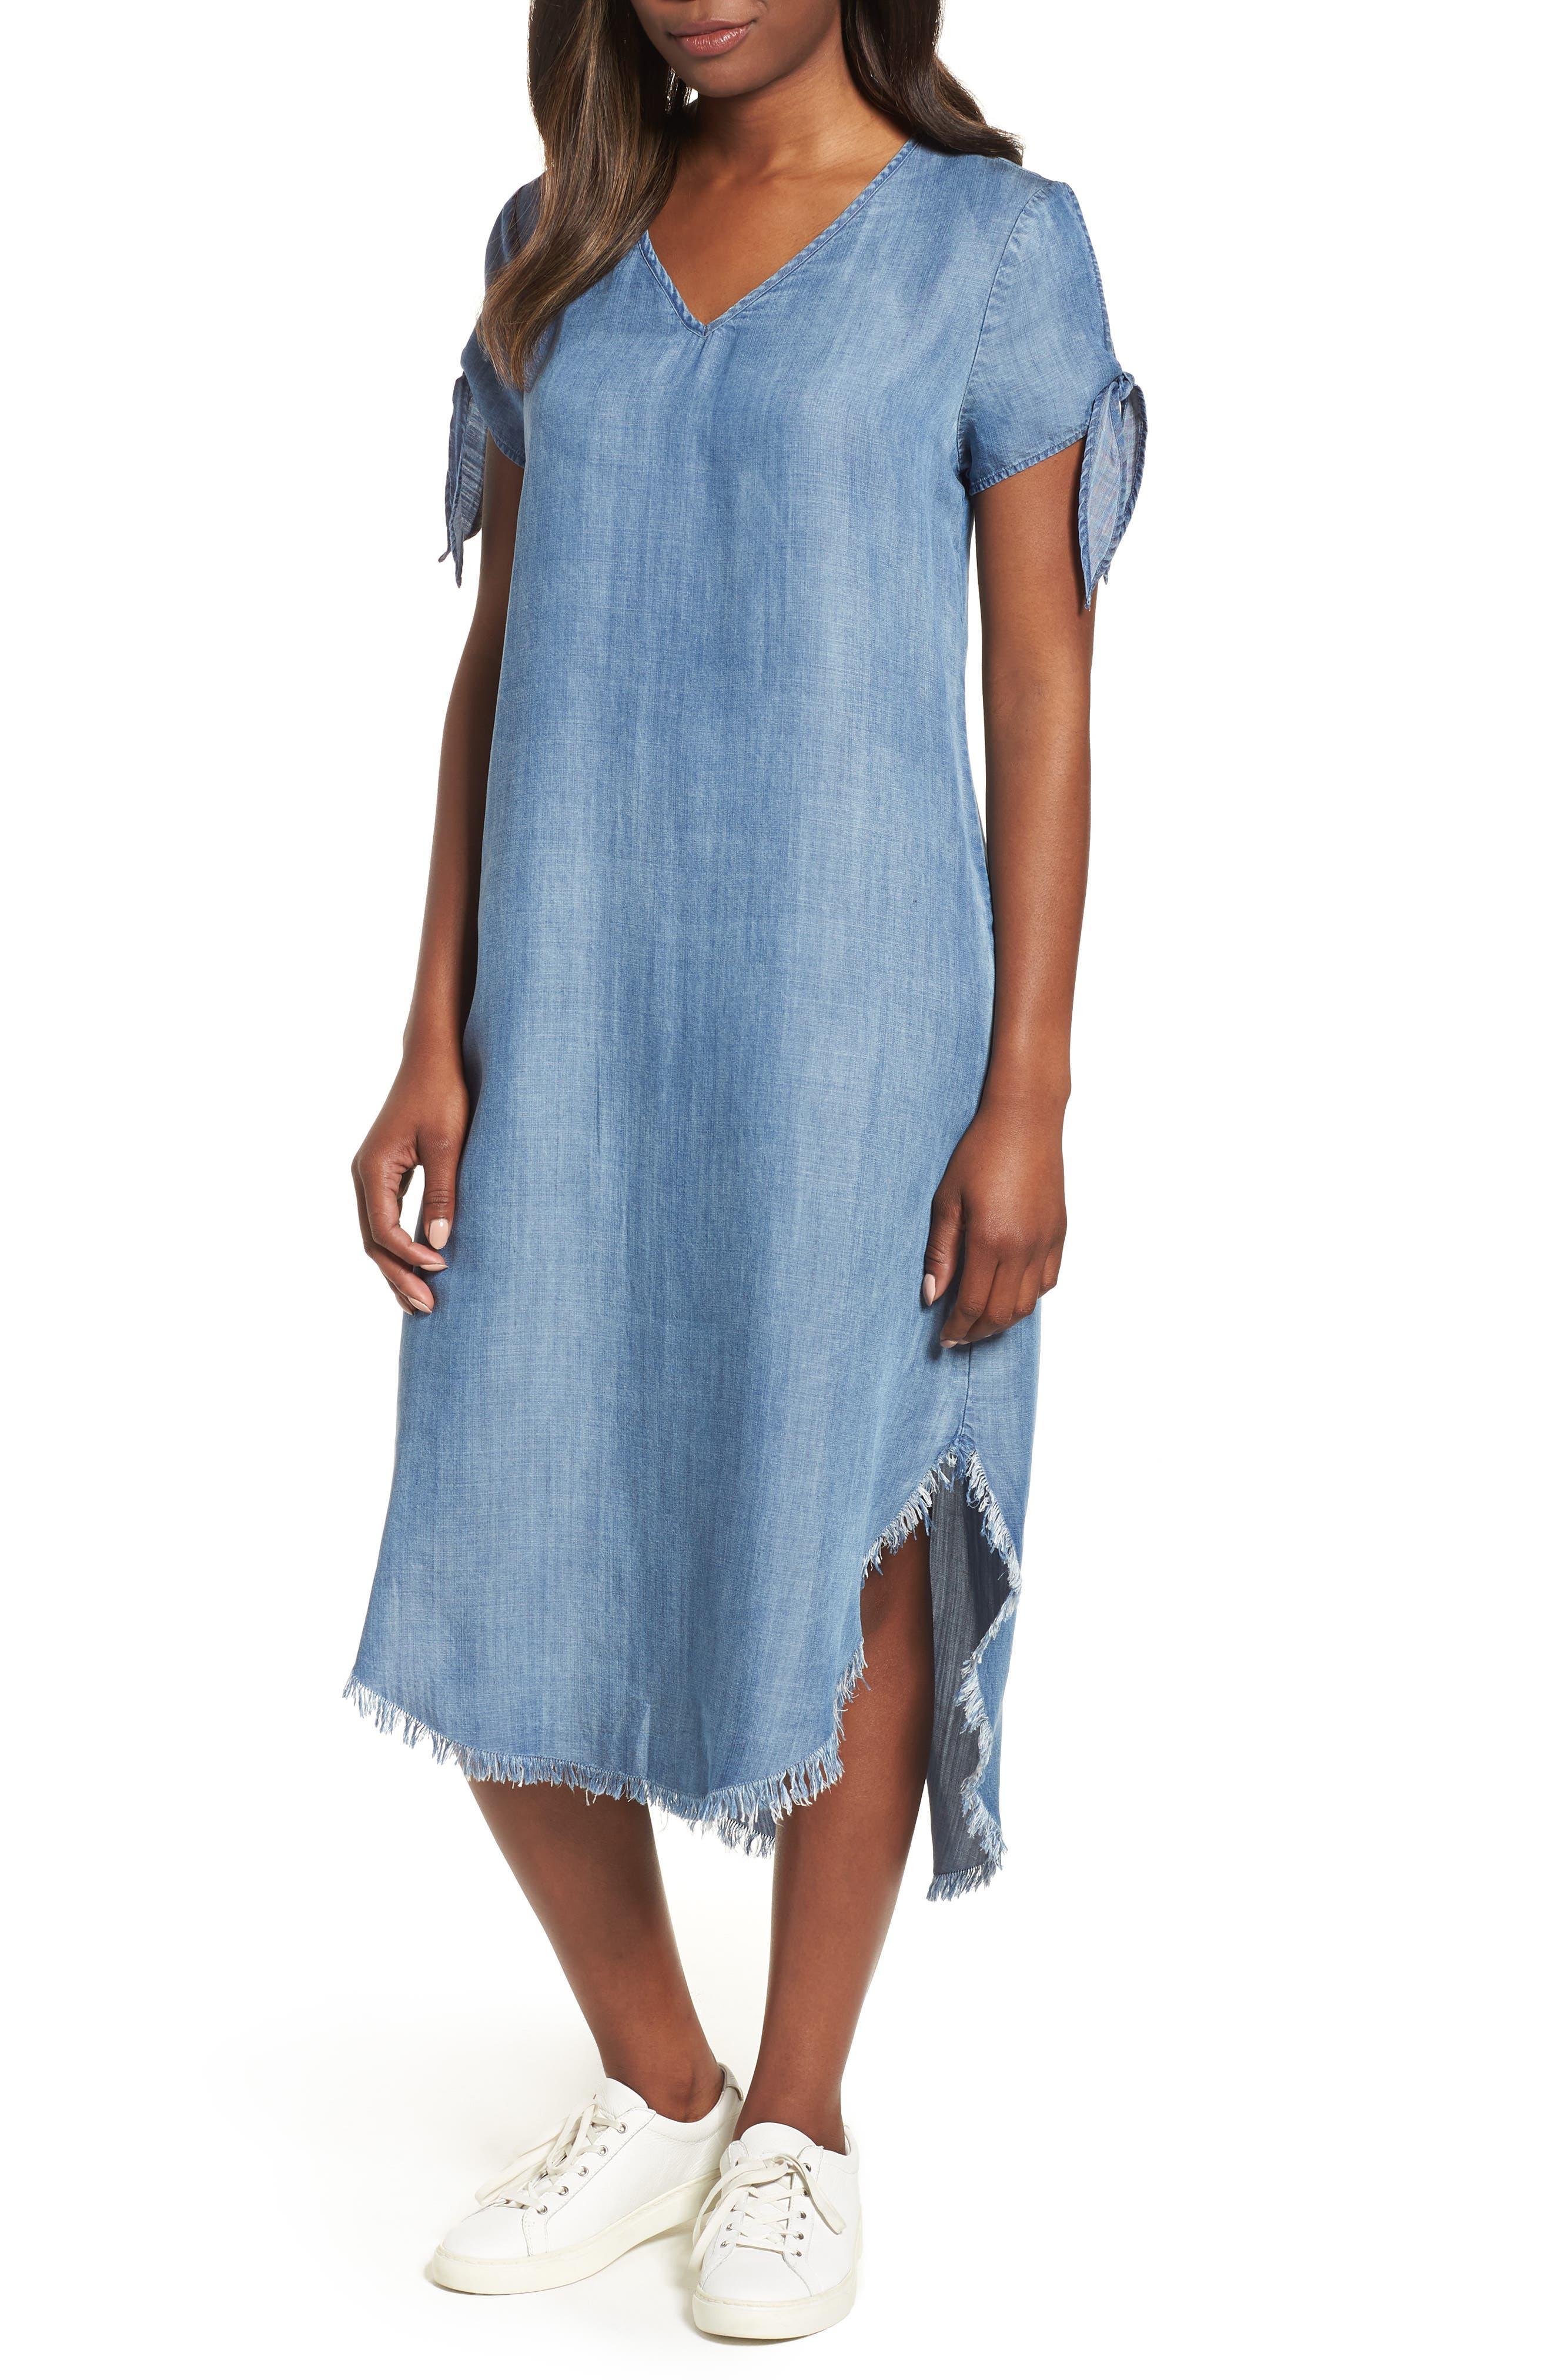 BILLY T TIE SLEEVE CHAMBRAY SHIFT DRESS